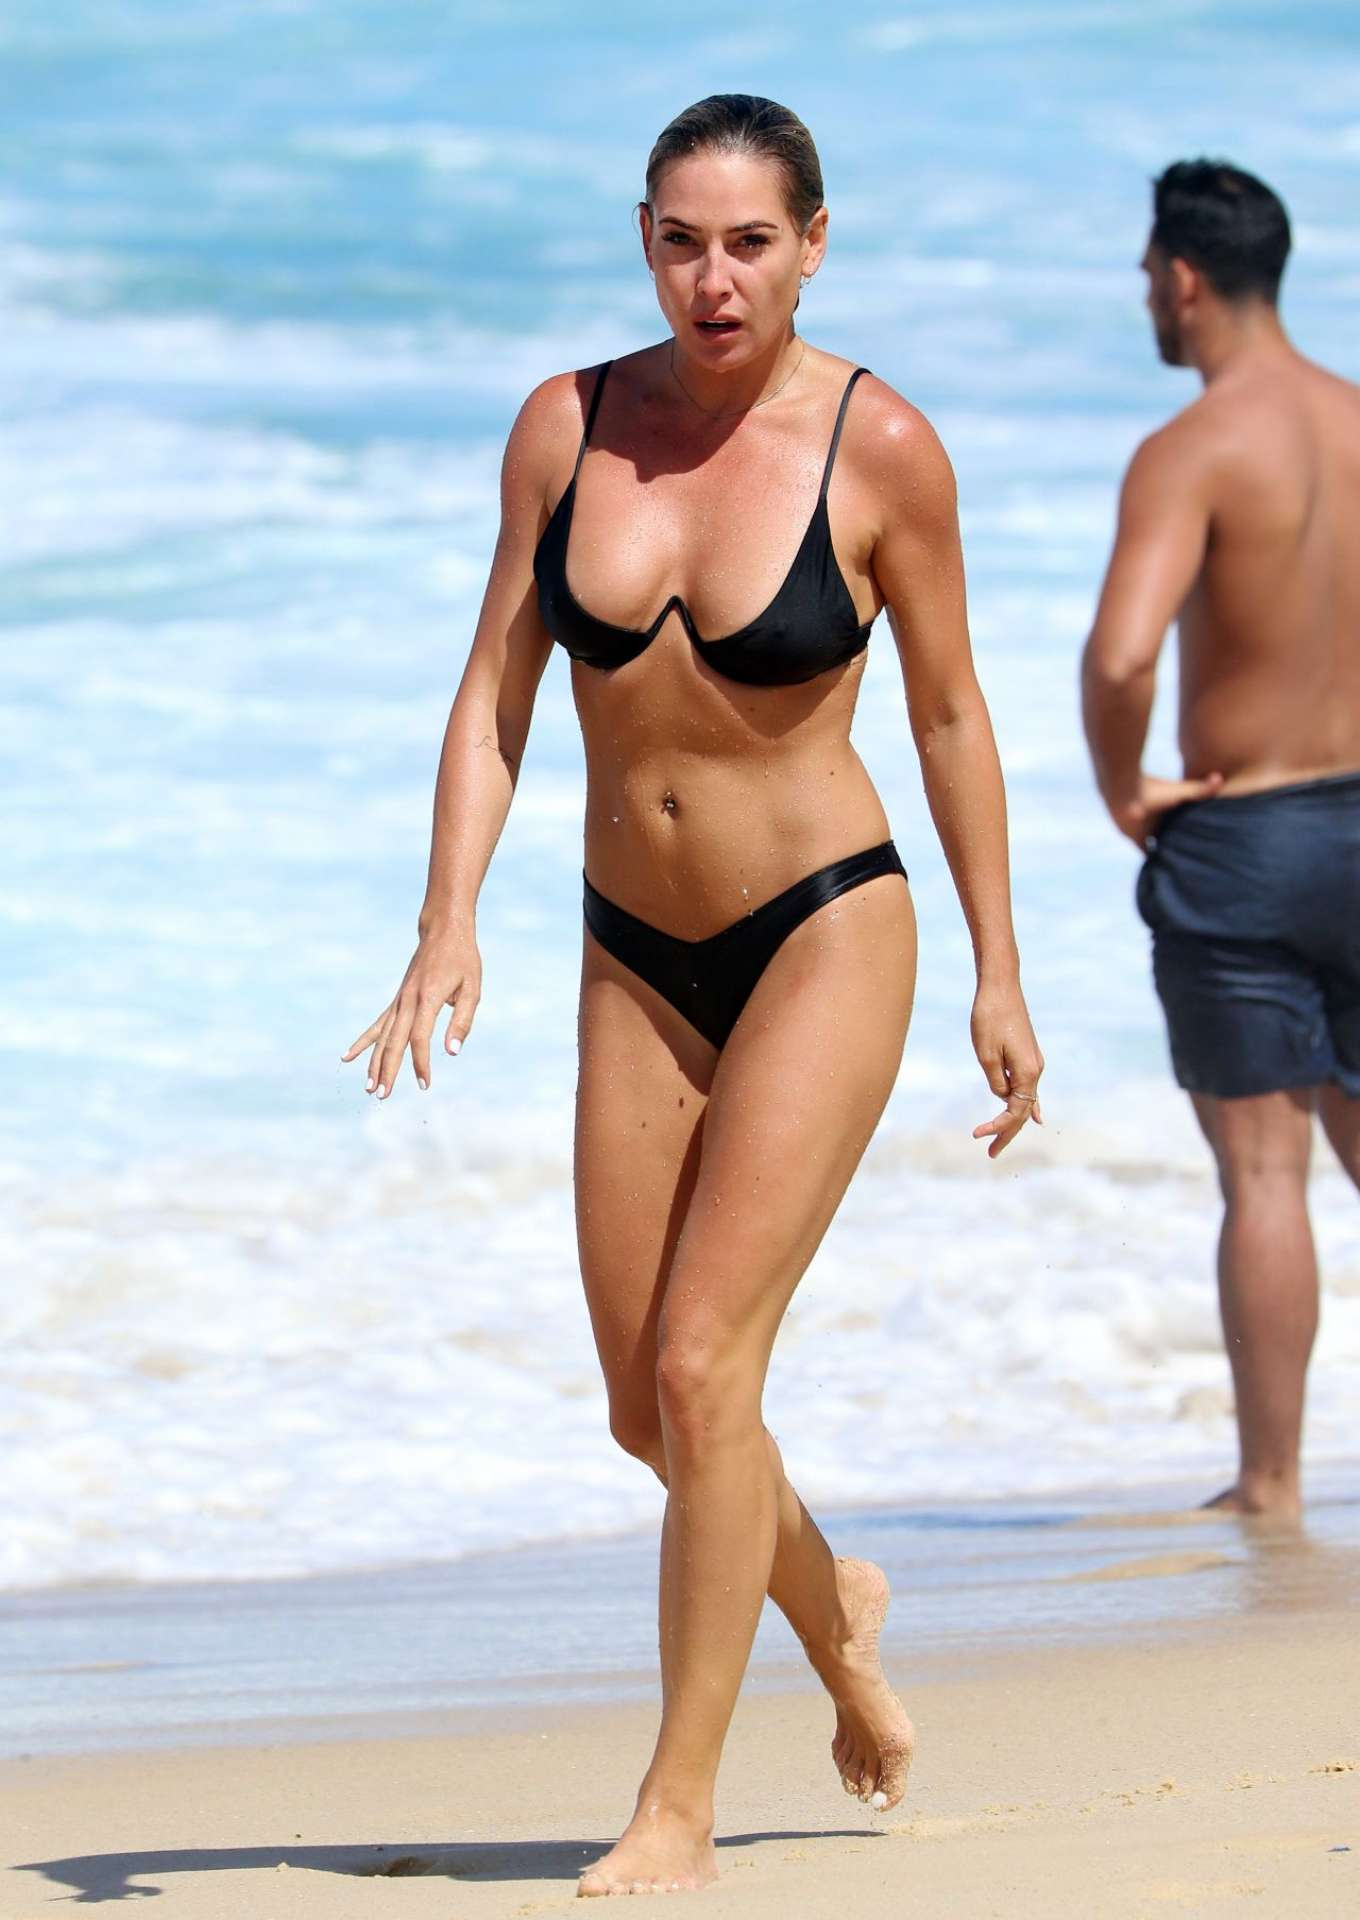 Bikini Lisa Clarke nudes (89 foto and video), Pussy, Fappening, Boobs, in bikini 2006